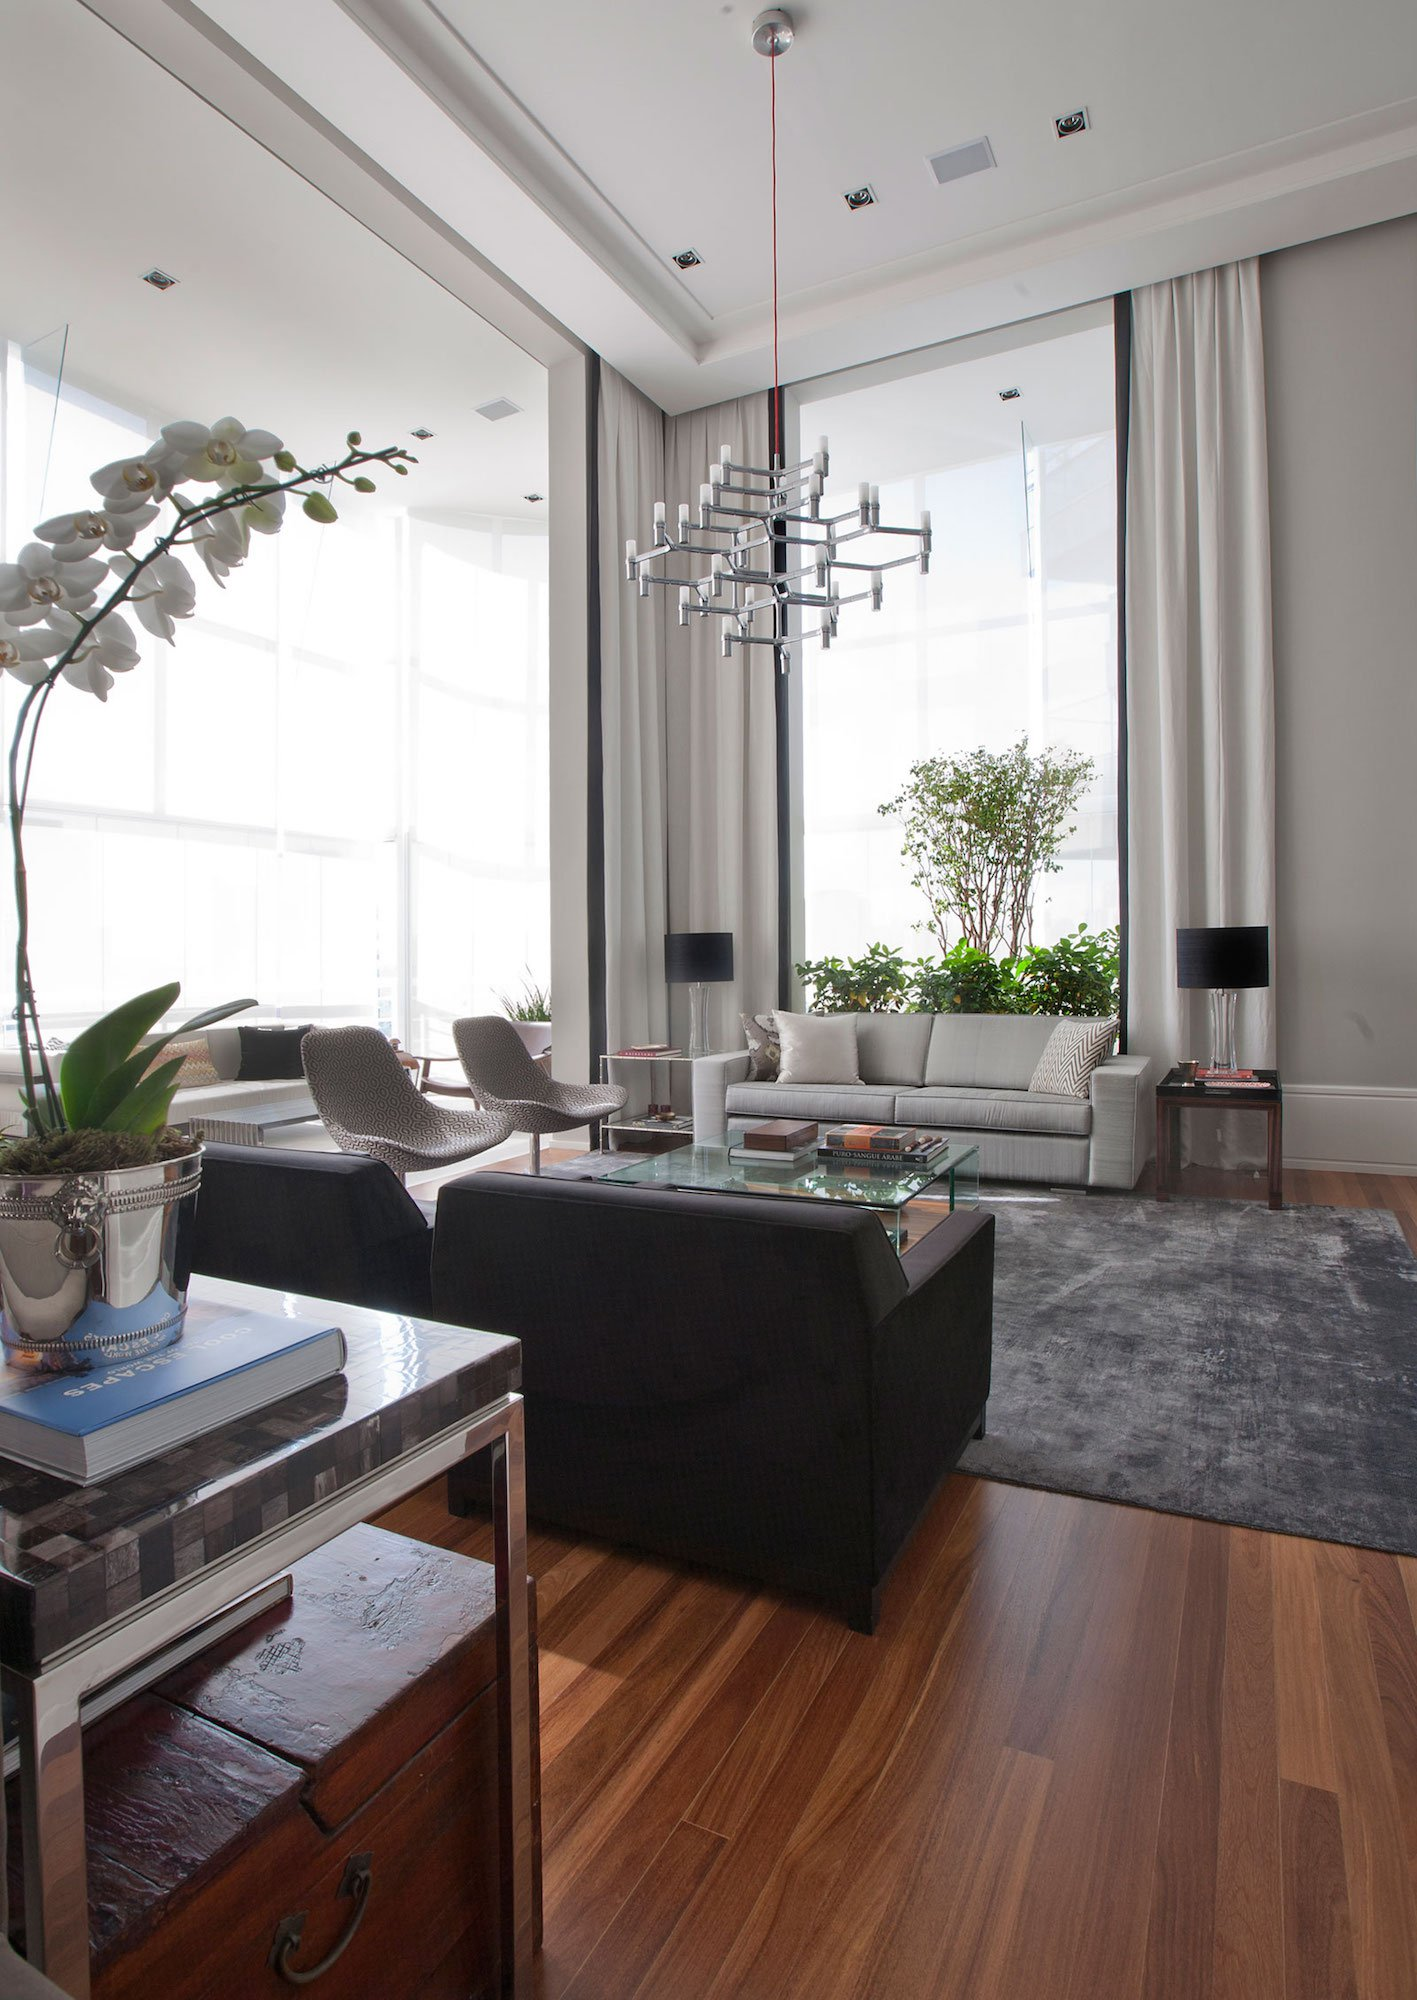 An-Elegant-Interior-05